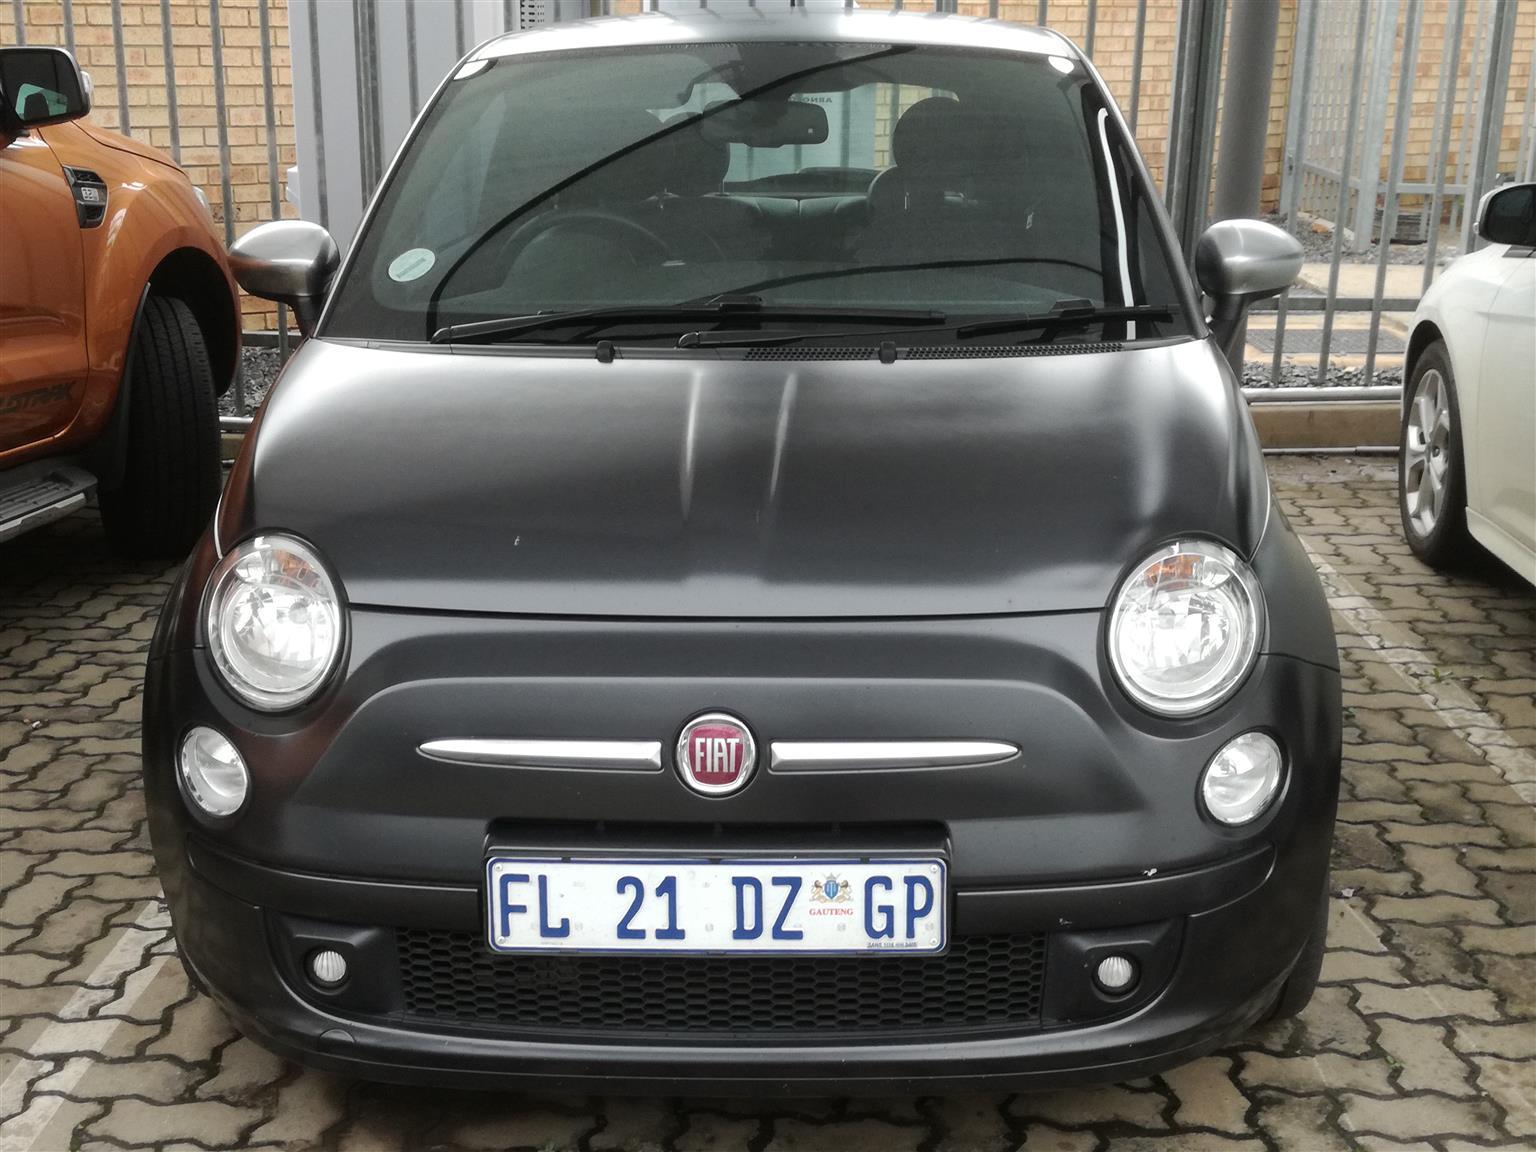 2012 Fiat 500 1.4 Matt Black